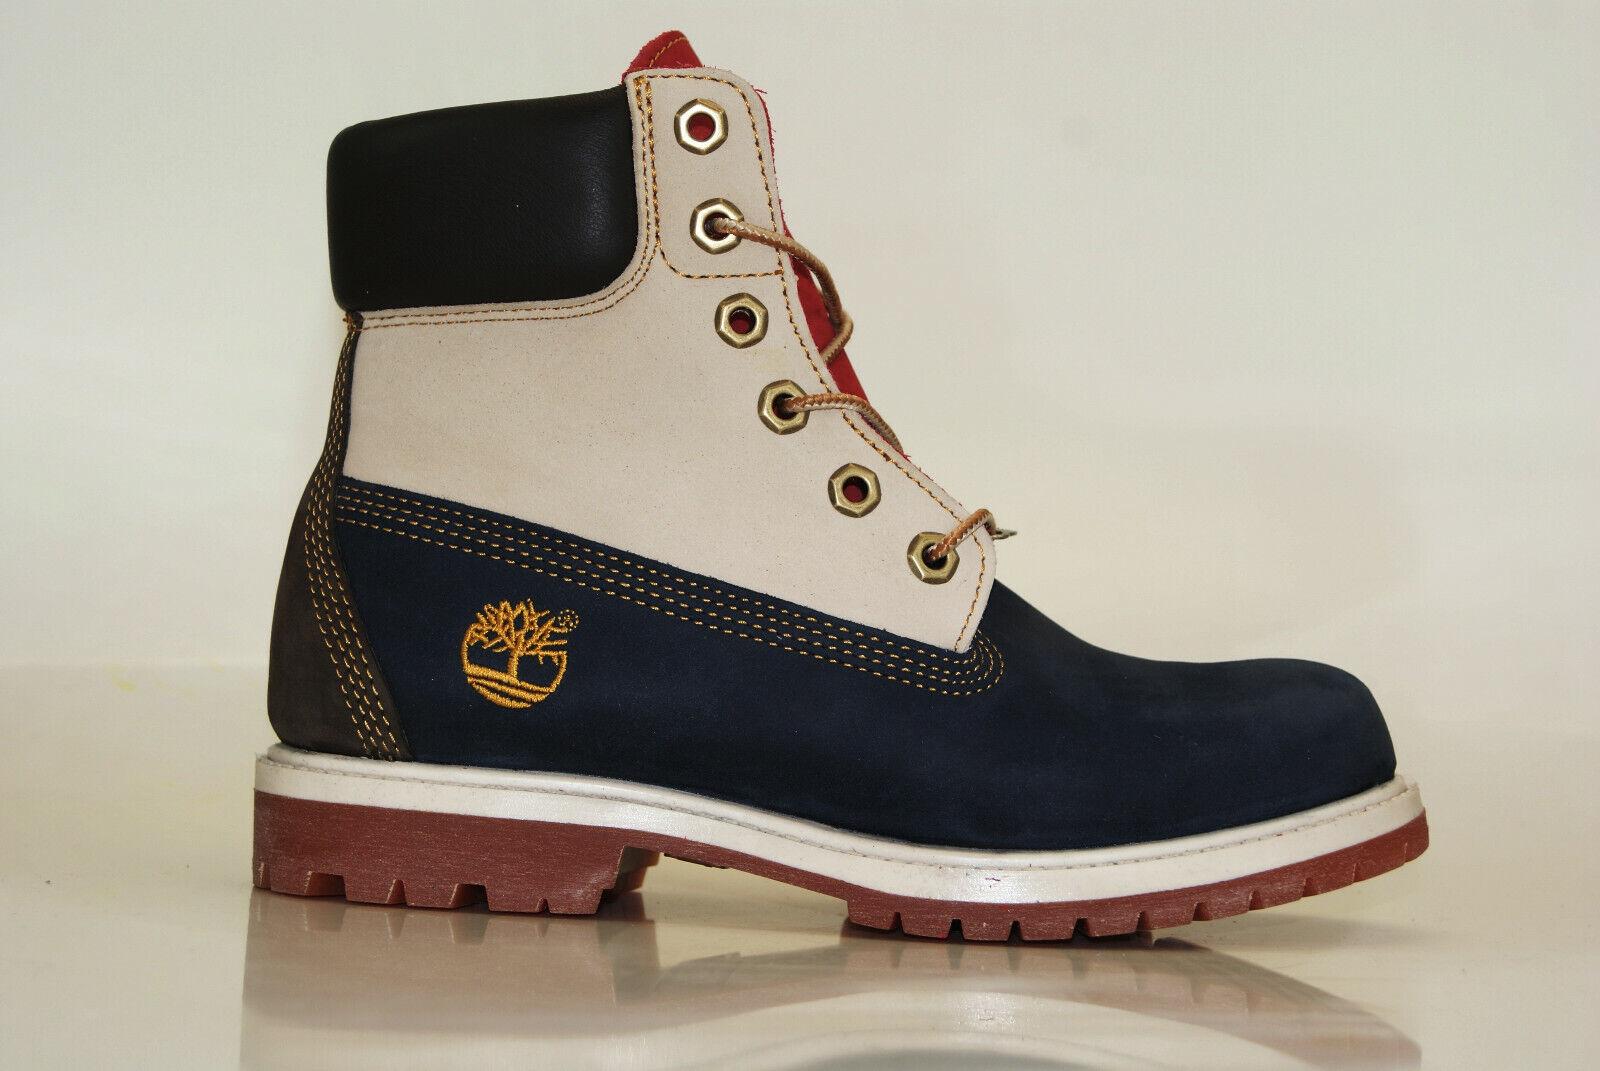 Toppkvalité försäljning återförsäljare affär Timberland 6 Inch Premium Boots Size 36 US 5,5W Waterproof Women ...